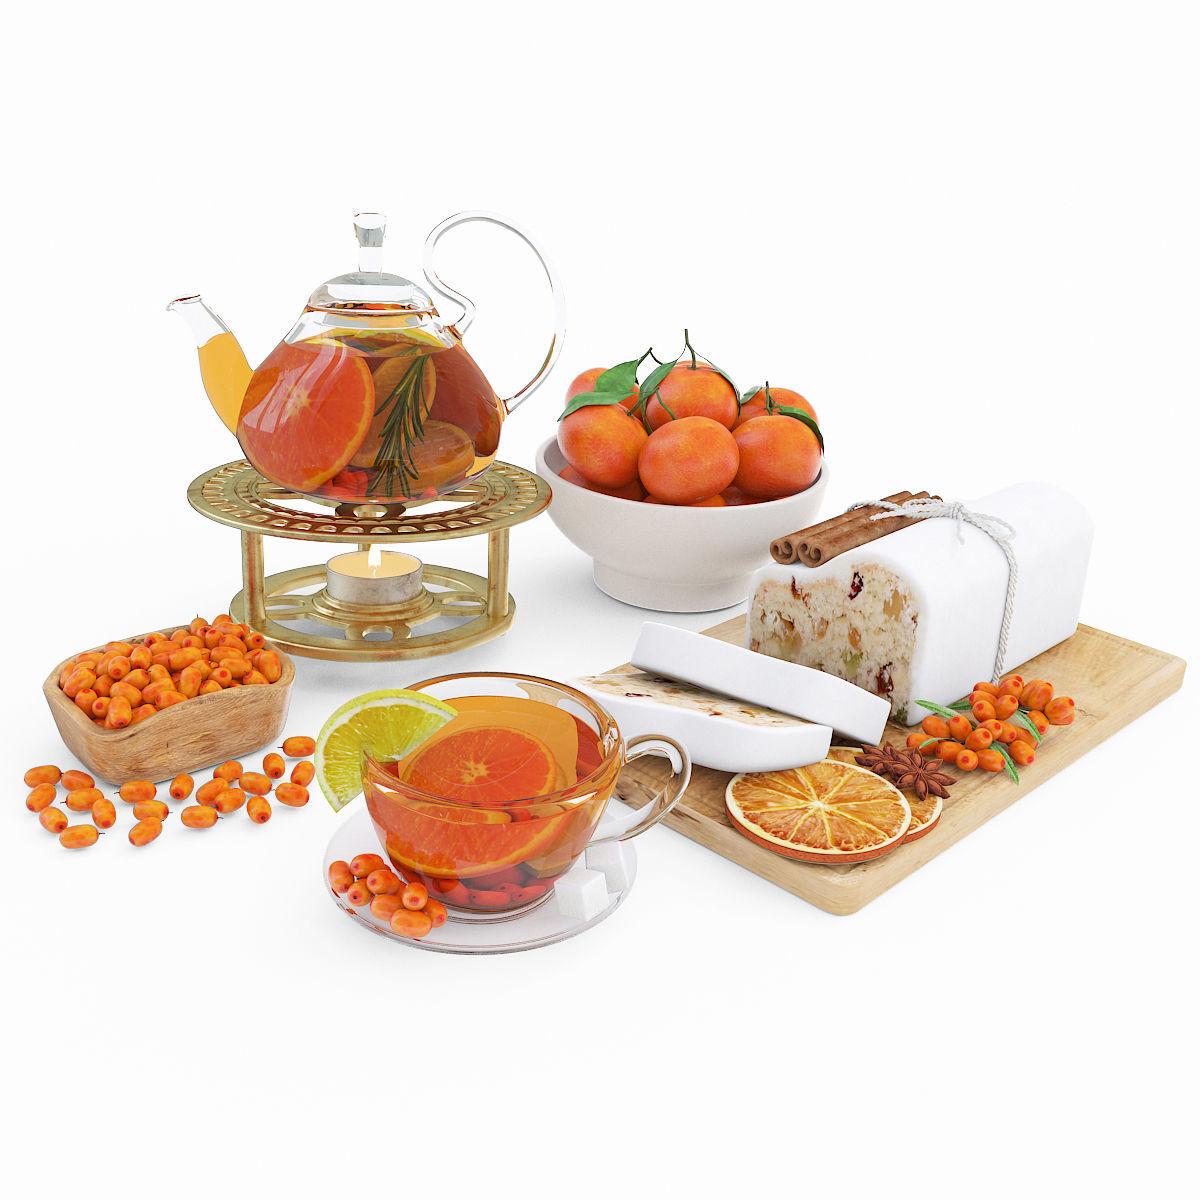 Fruit tea and tangerines